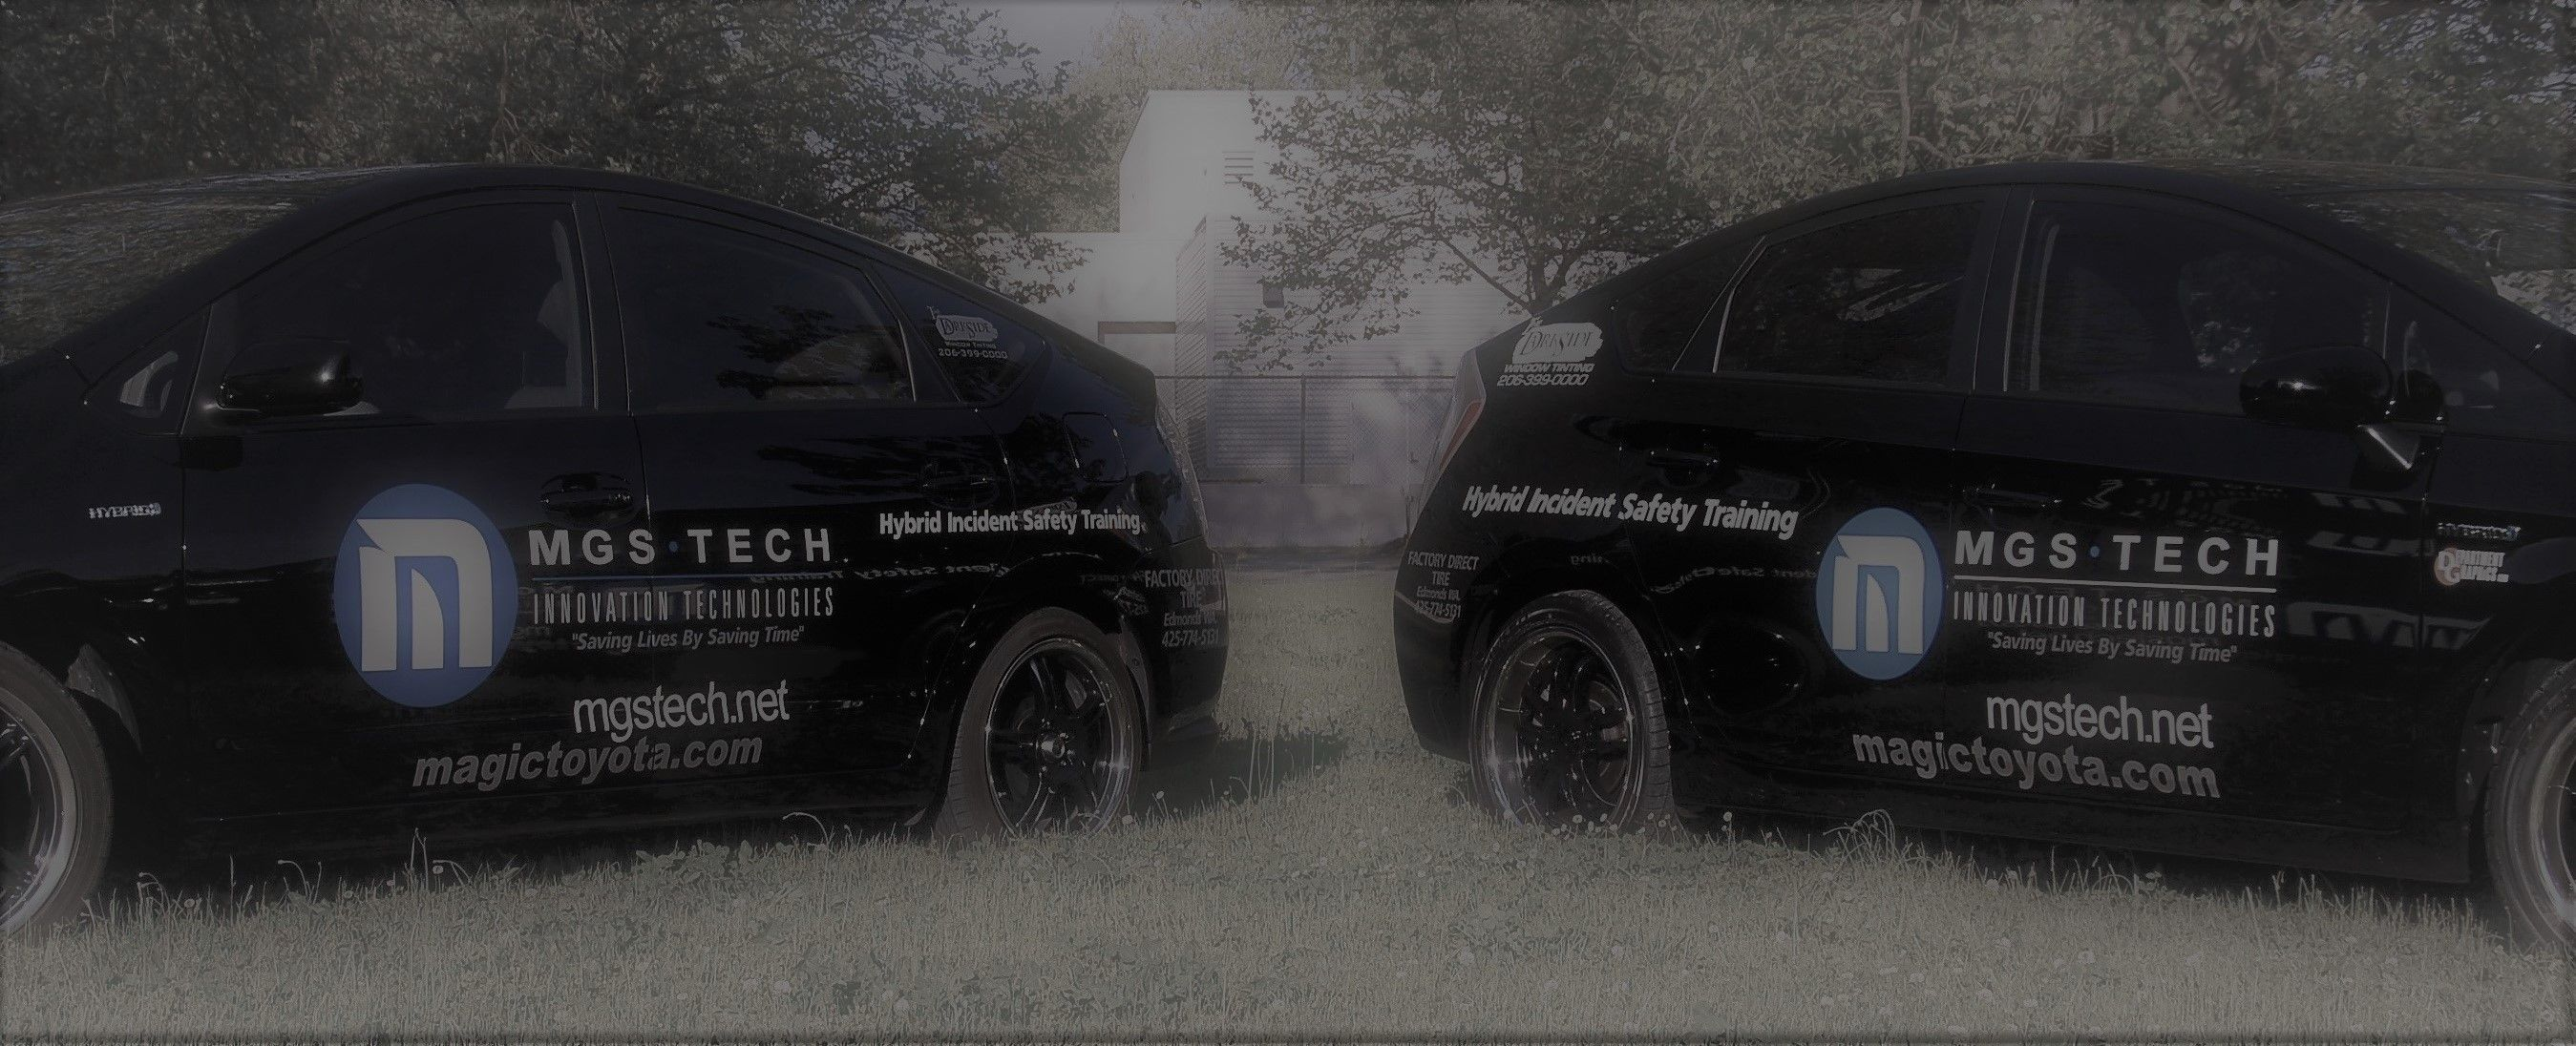 MGS Tech Toyota Prius Fleet